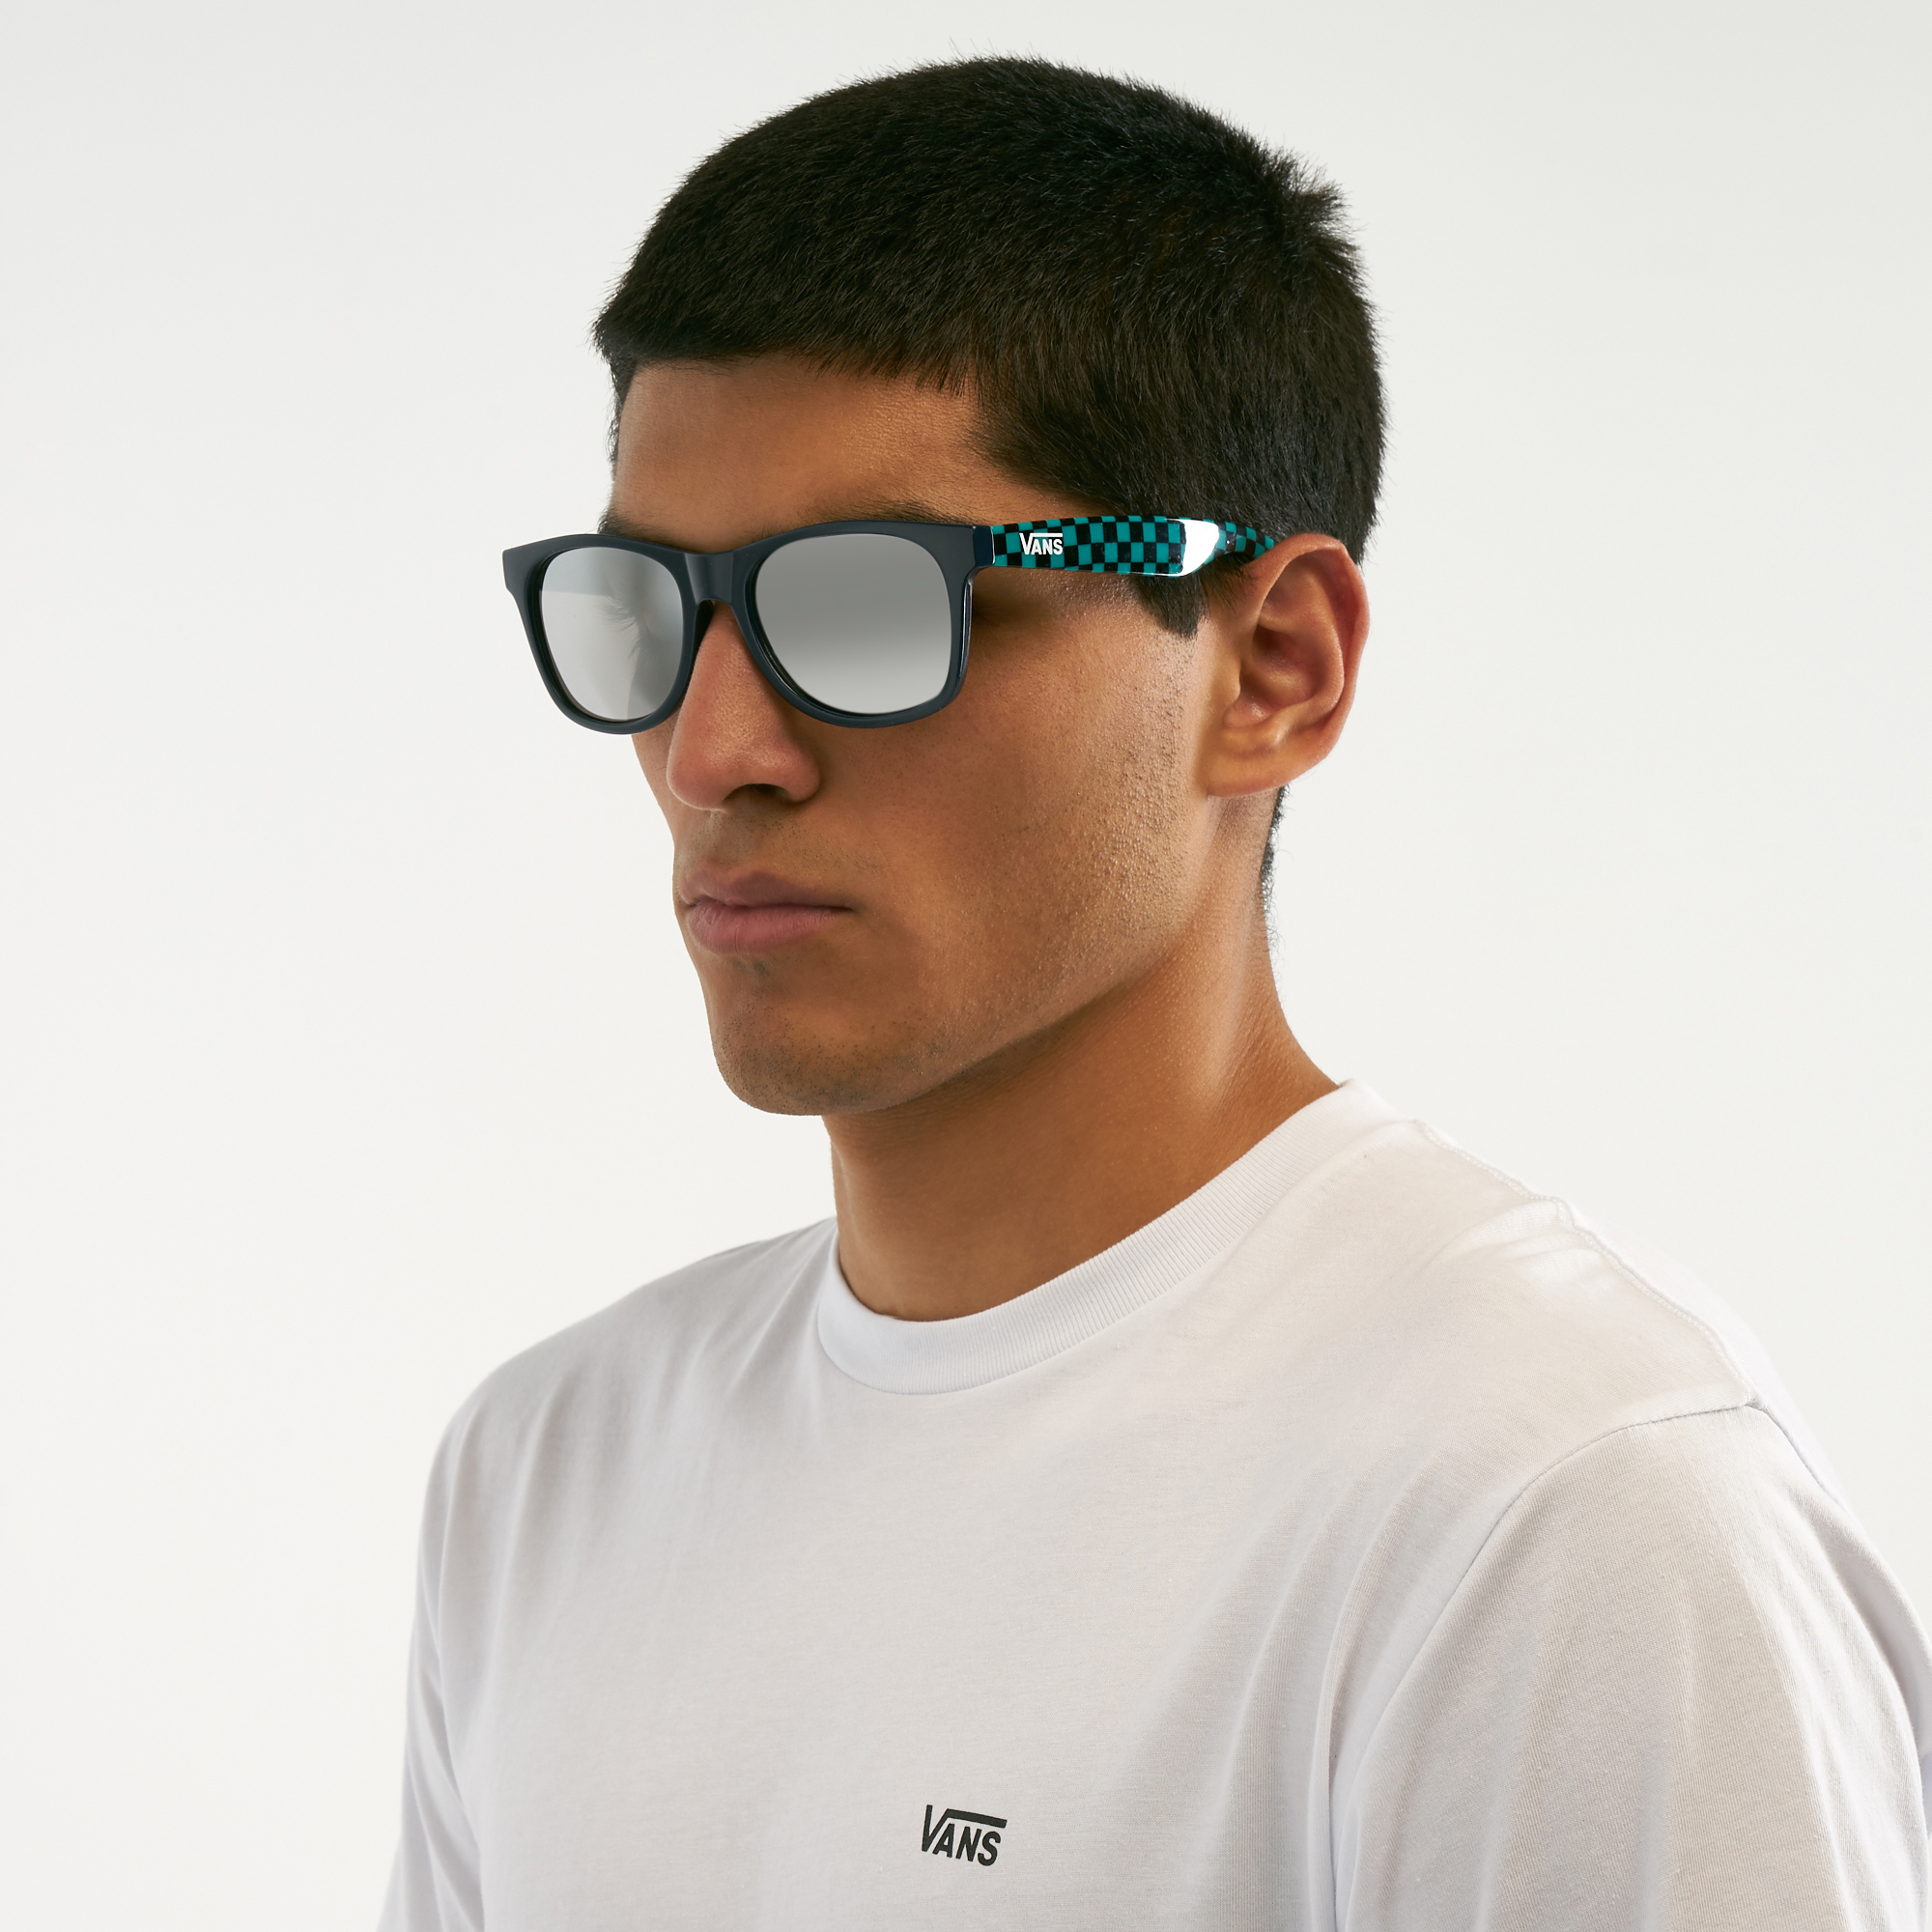 Vans Men S Spicoli 4 Shades Sunglasses Sunglasses Accessories Mens Sss